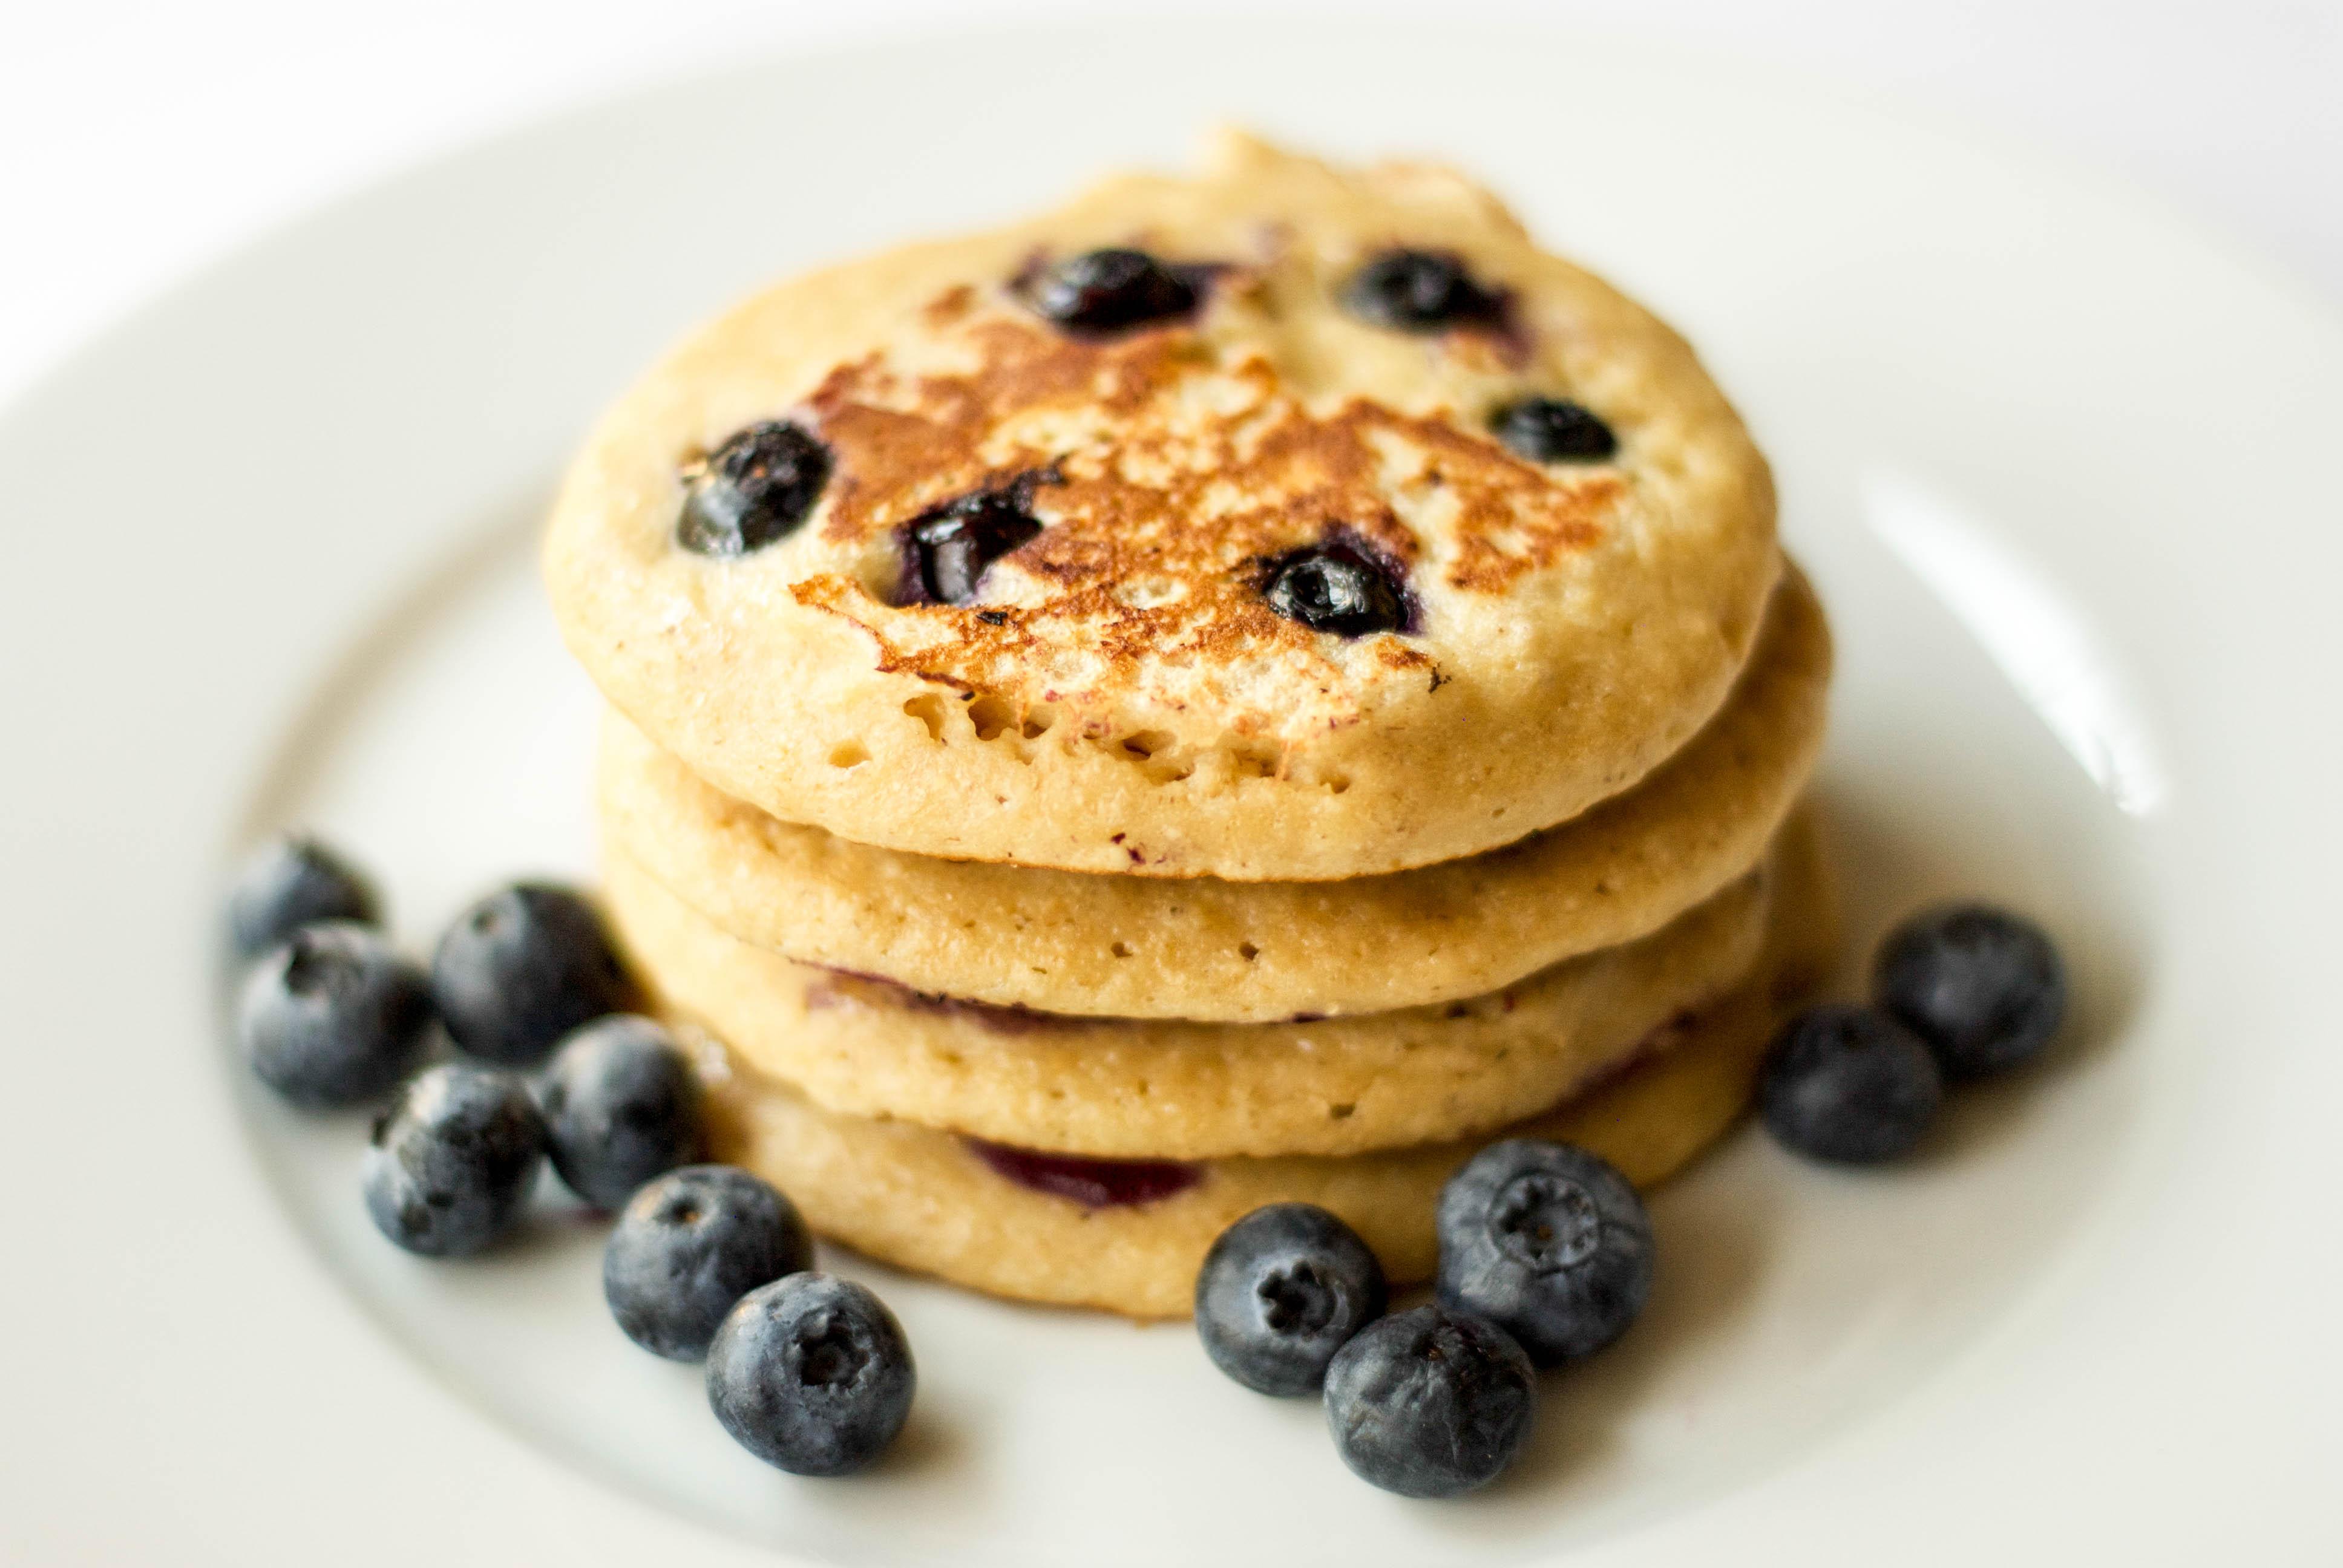 Blueberry Yogurt Pancakes | Family Food Forum